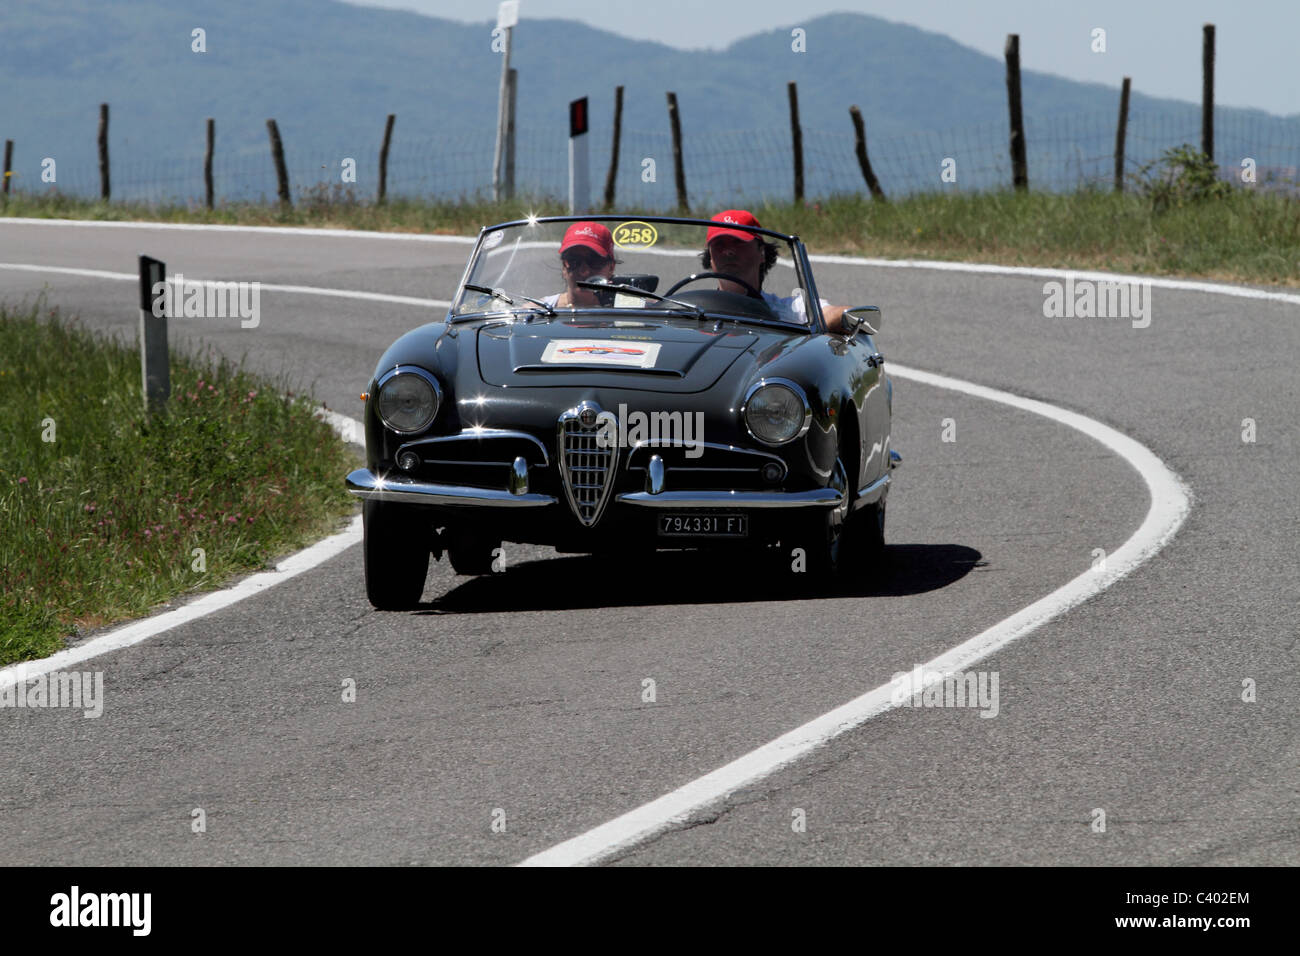 Mille Miglia 2011 Alfa Romeo Stockbild